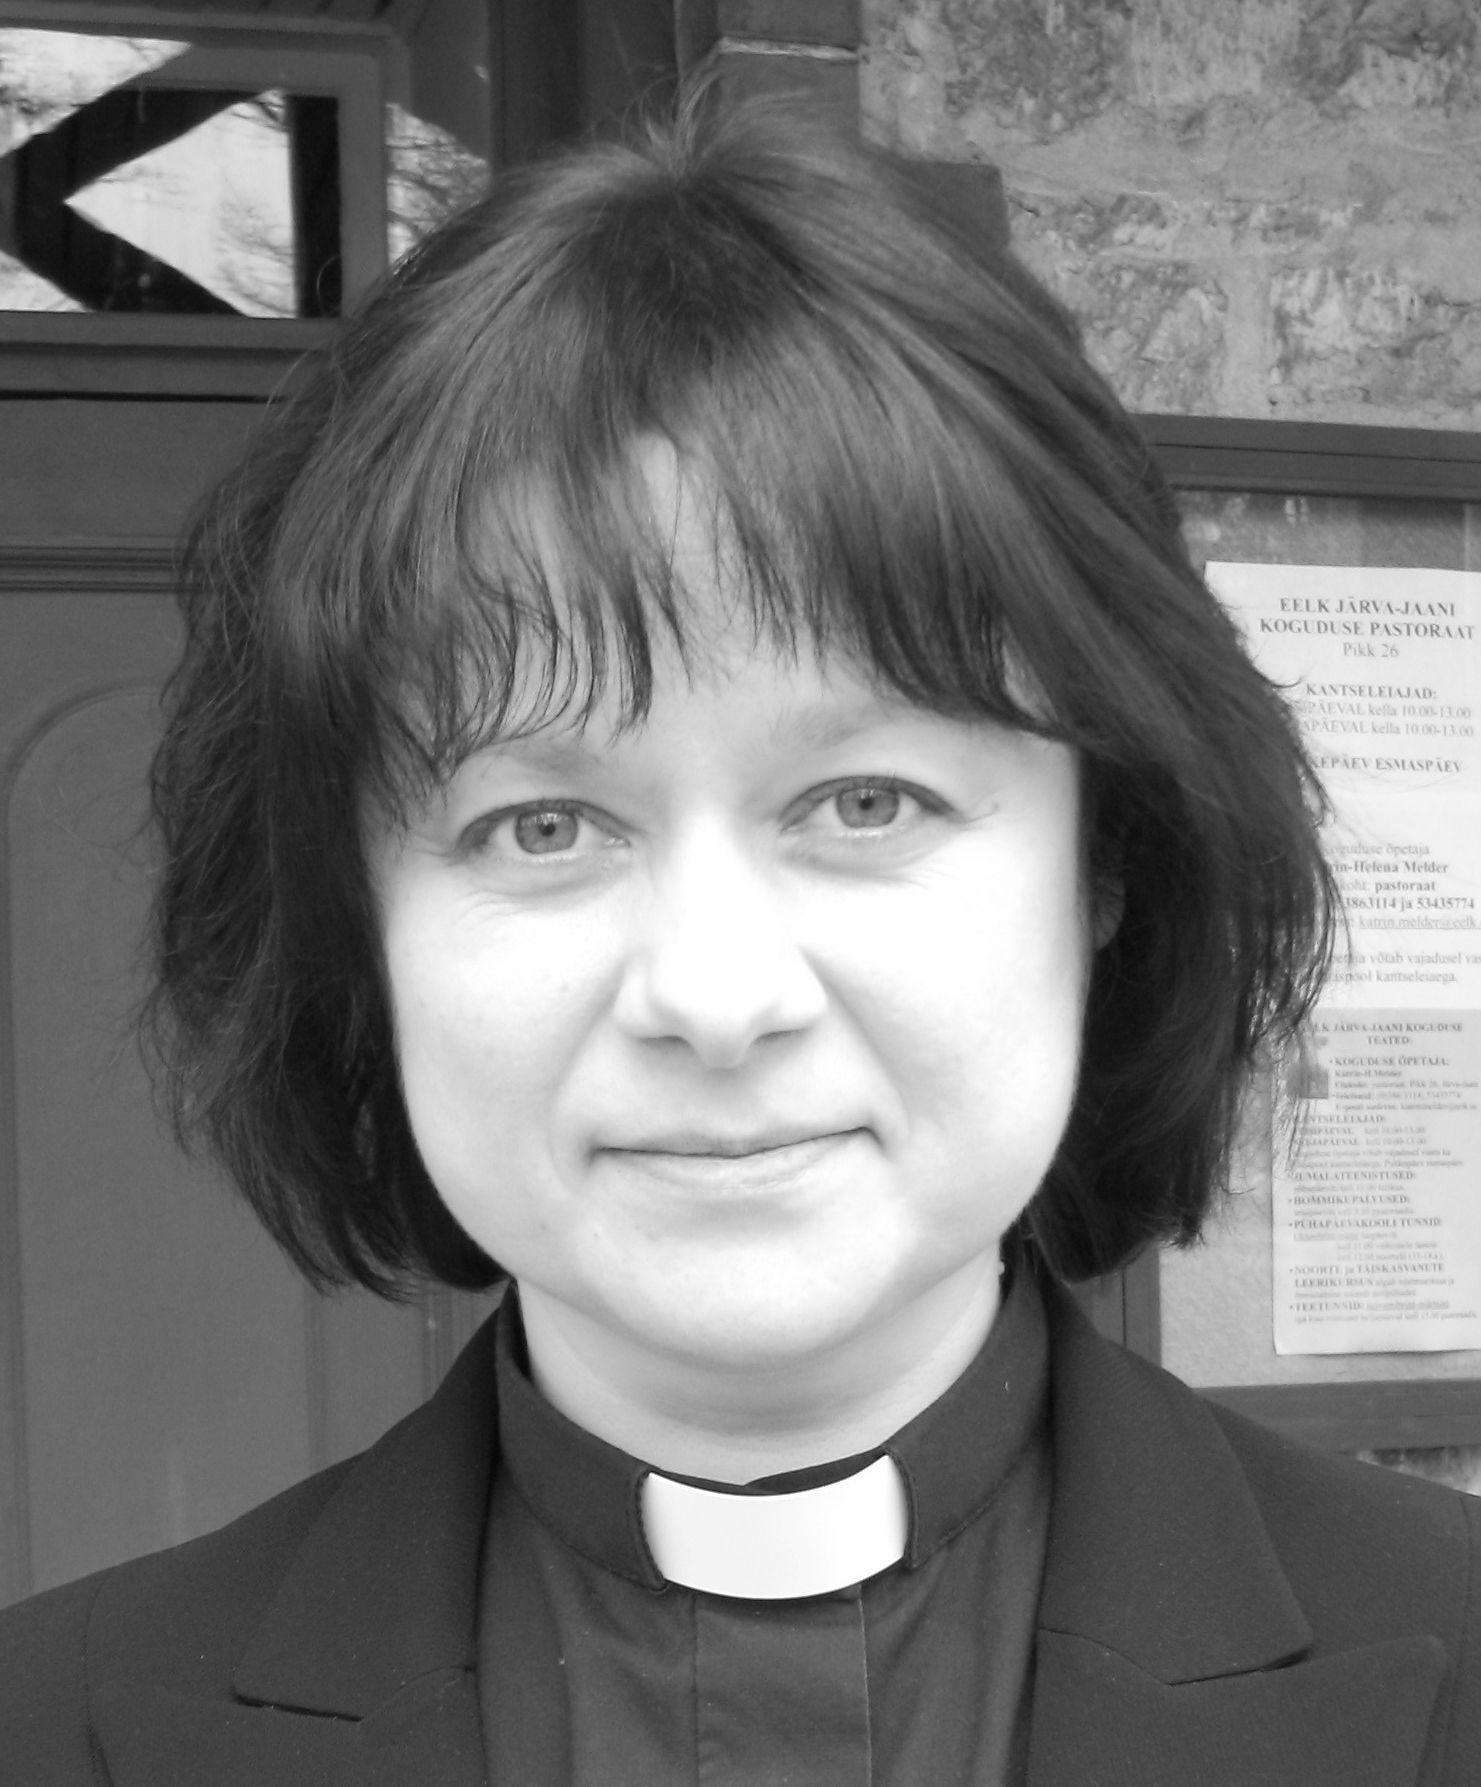 Katrin-Helena Melder